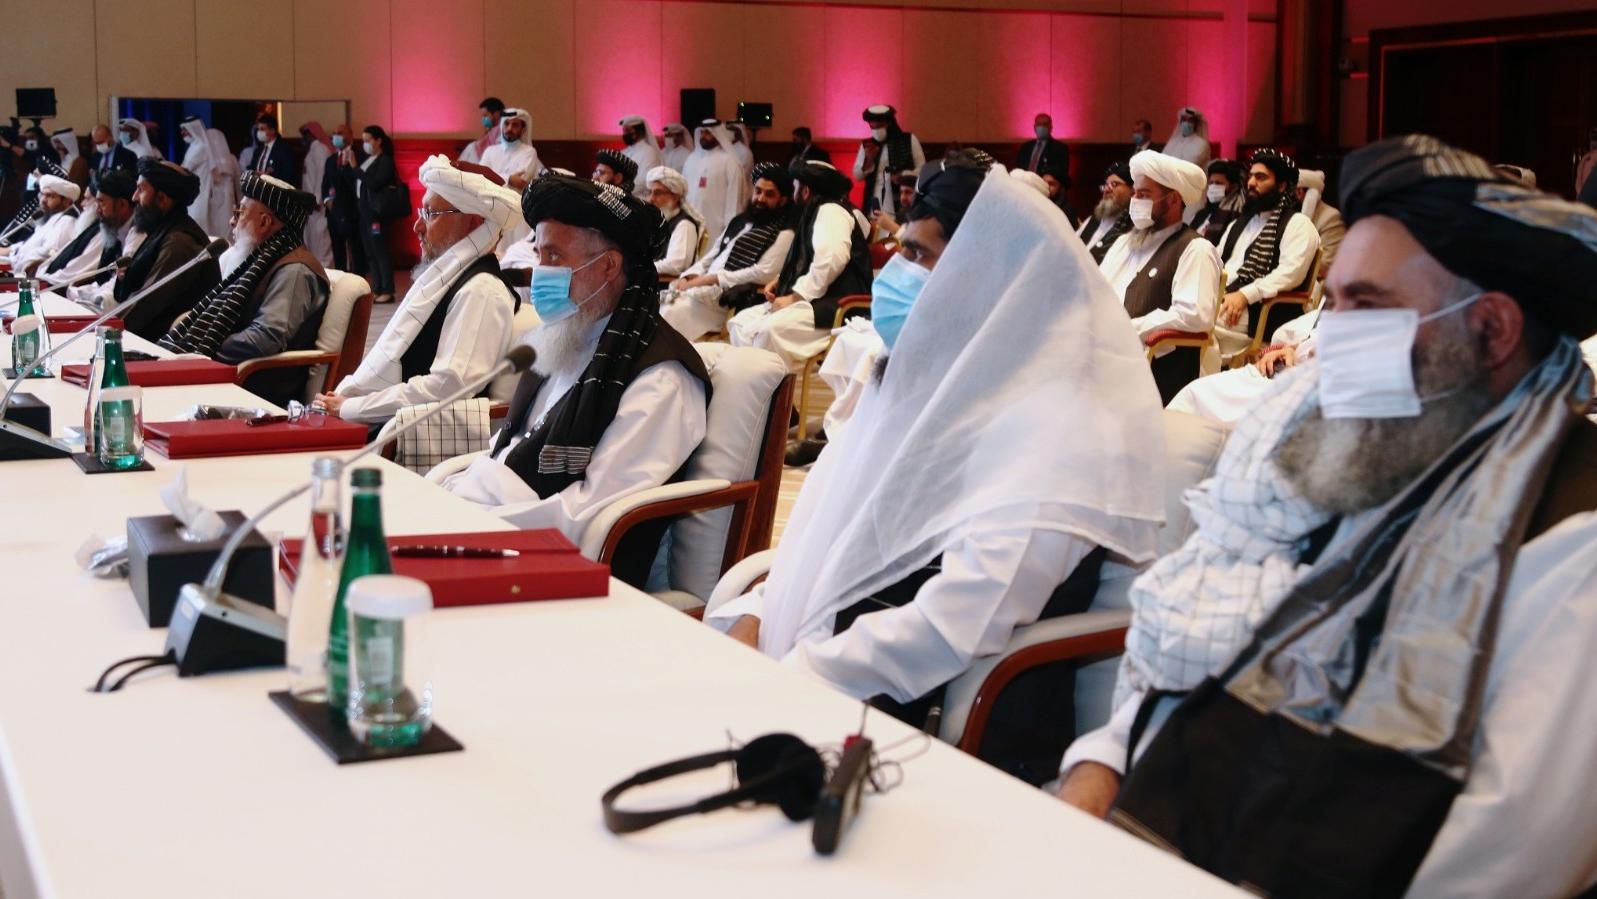 Delegates attend talks between Afghan government and Taliban representatives in Doha, Qatar, September 12, 2020, photo by Ibraheem al Omari/Reuters